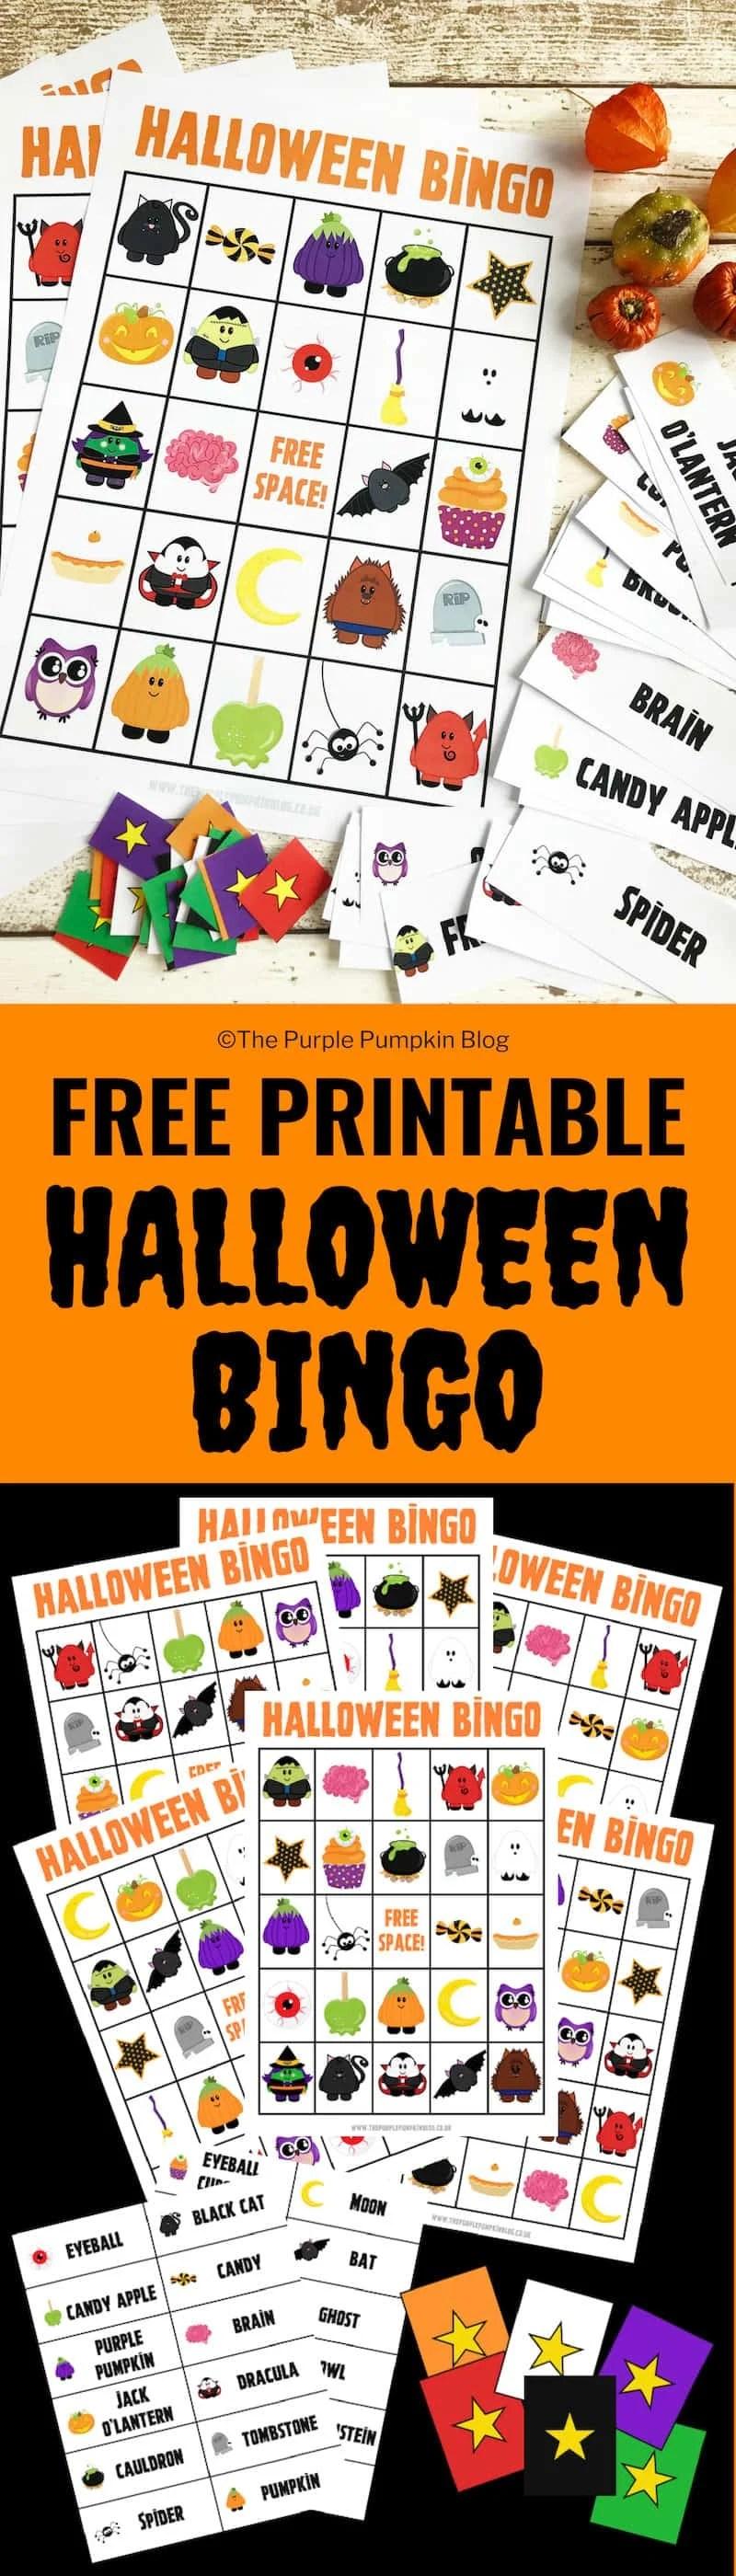 photo about Halloween Bingo Free Printable named Pleasurable Free of charge Printable Halloween Bingo Activity!